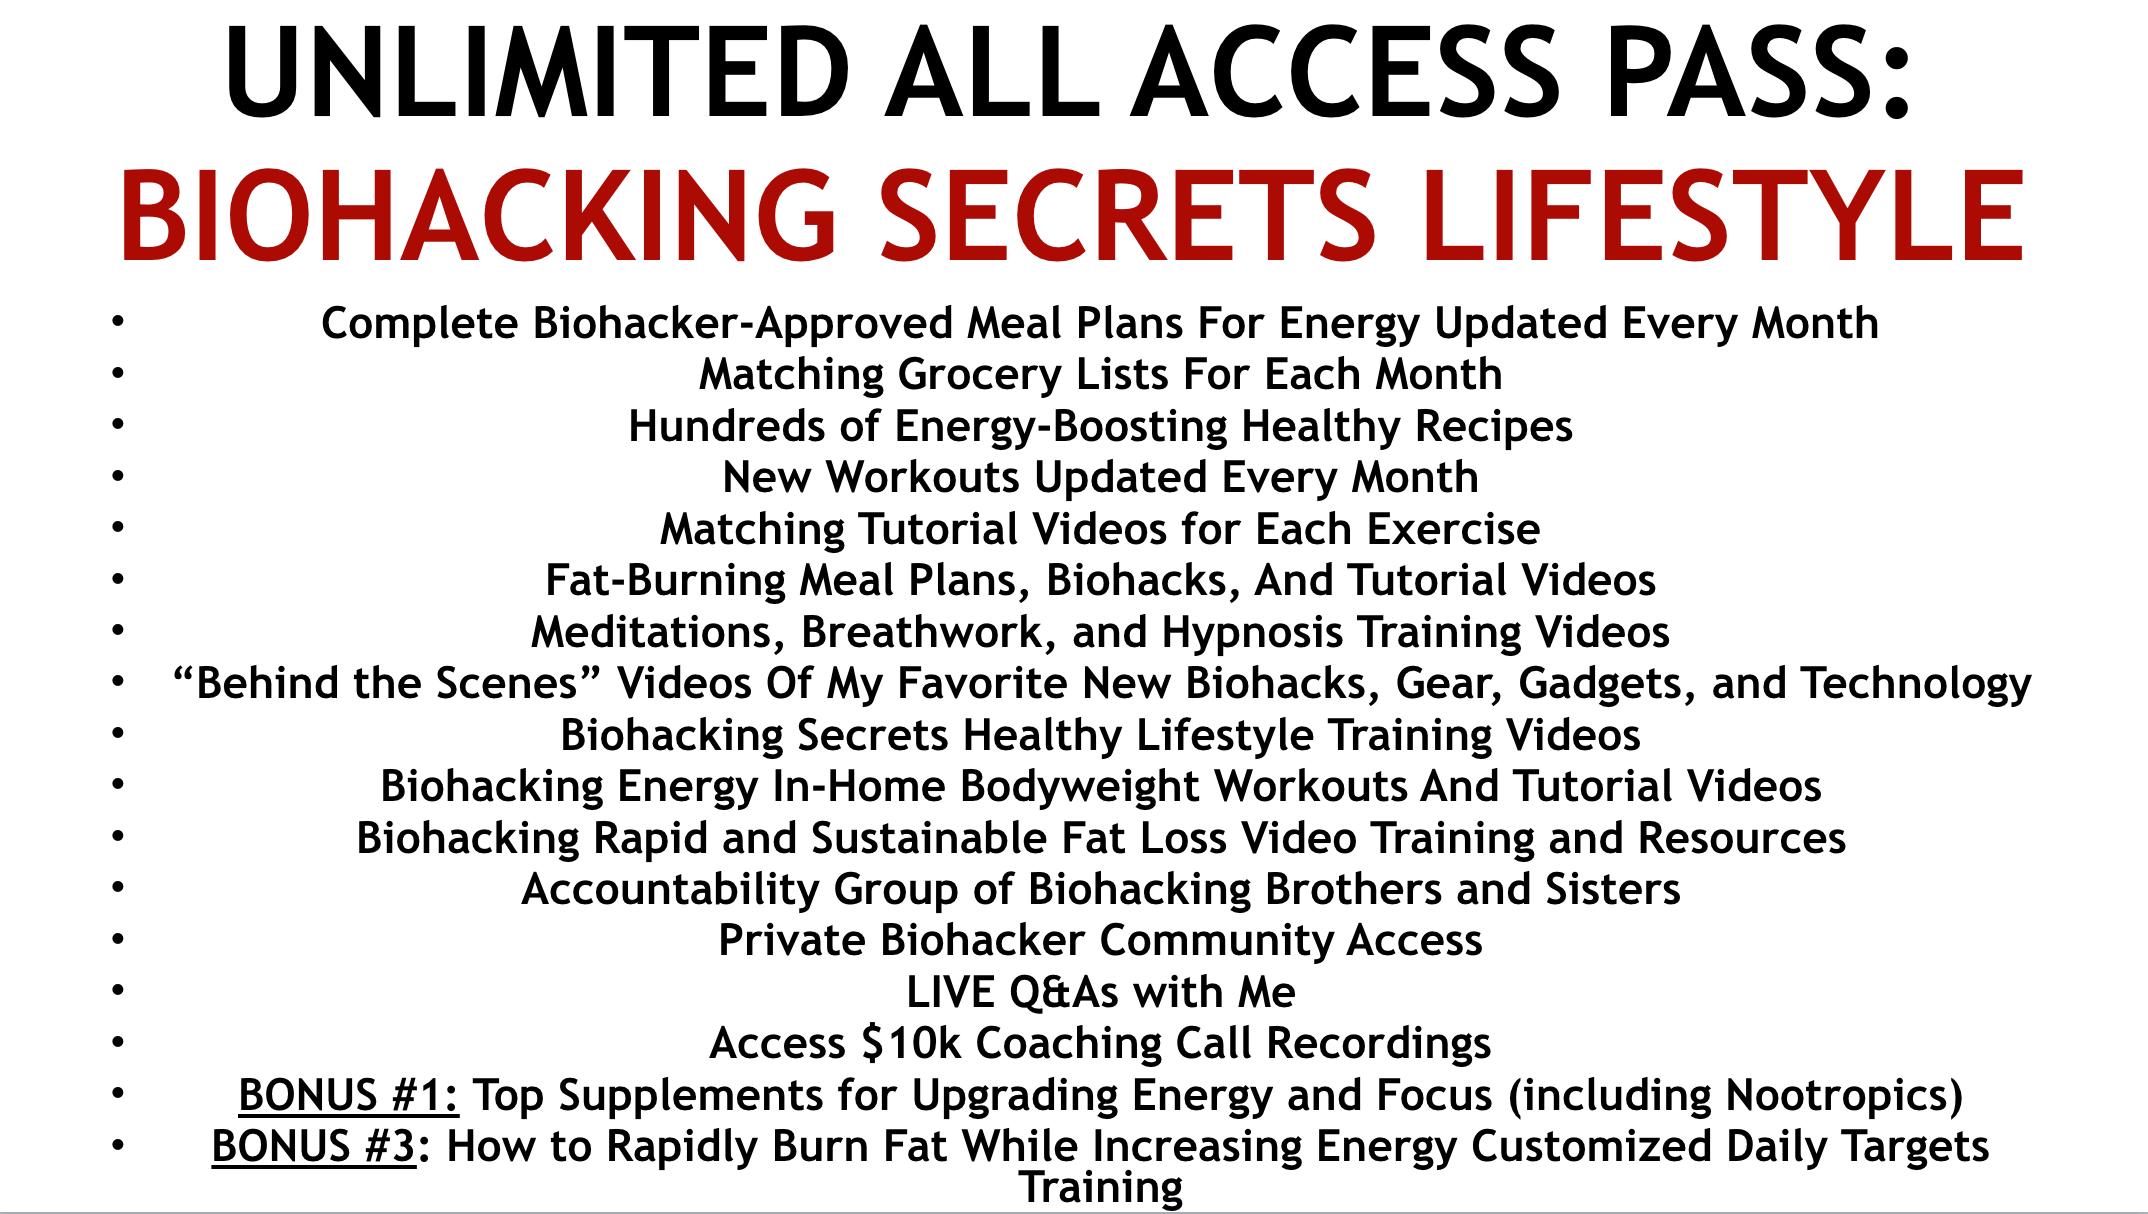 Biohacking Secrets